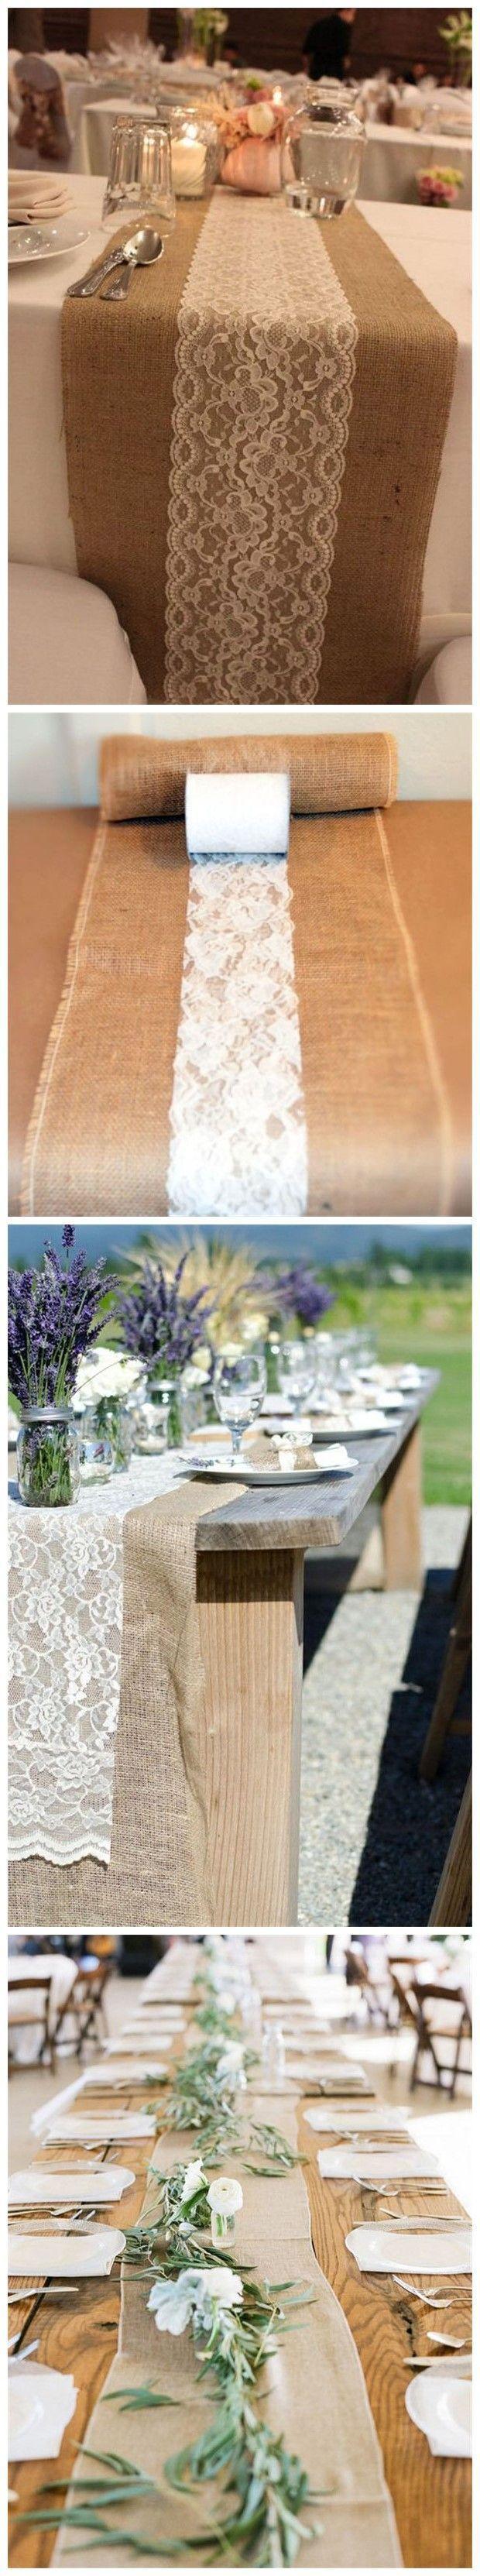 Diy Wedding Ideas » 22 Rustic Burlap Wedding Table Runner Ideas You Will Love » ❤️